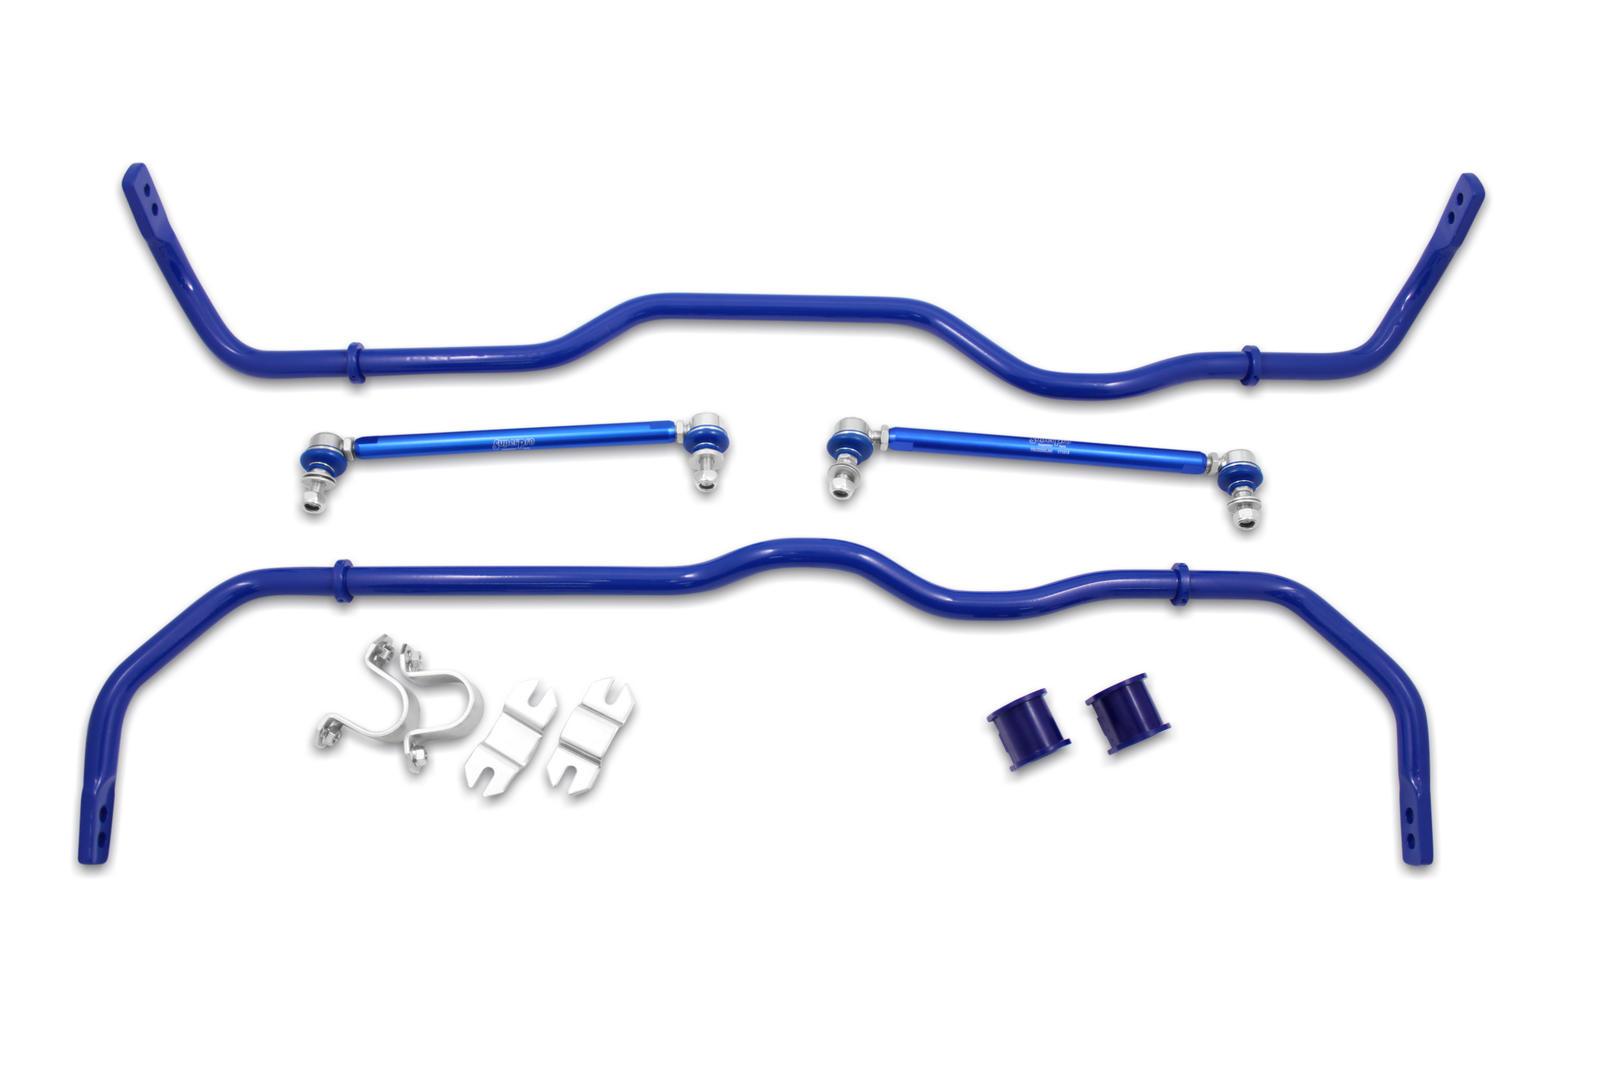 Superpro Suspension Parts And Poly Bushings For Vw Golf 2005 2008 Volkswagen Beetle Front Components Car Diagram Sway Bar Stabiliser Kit